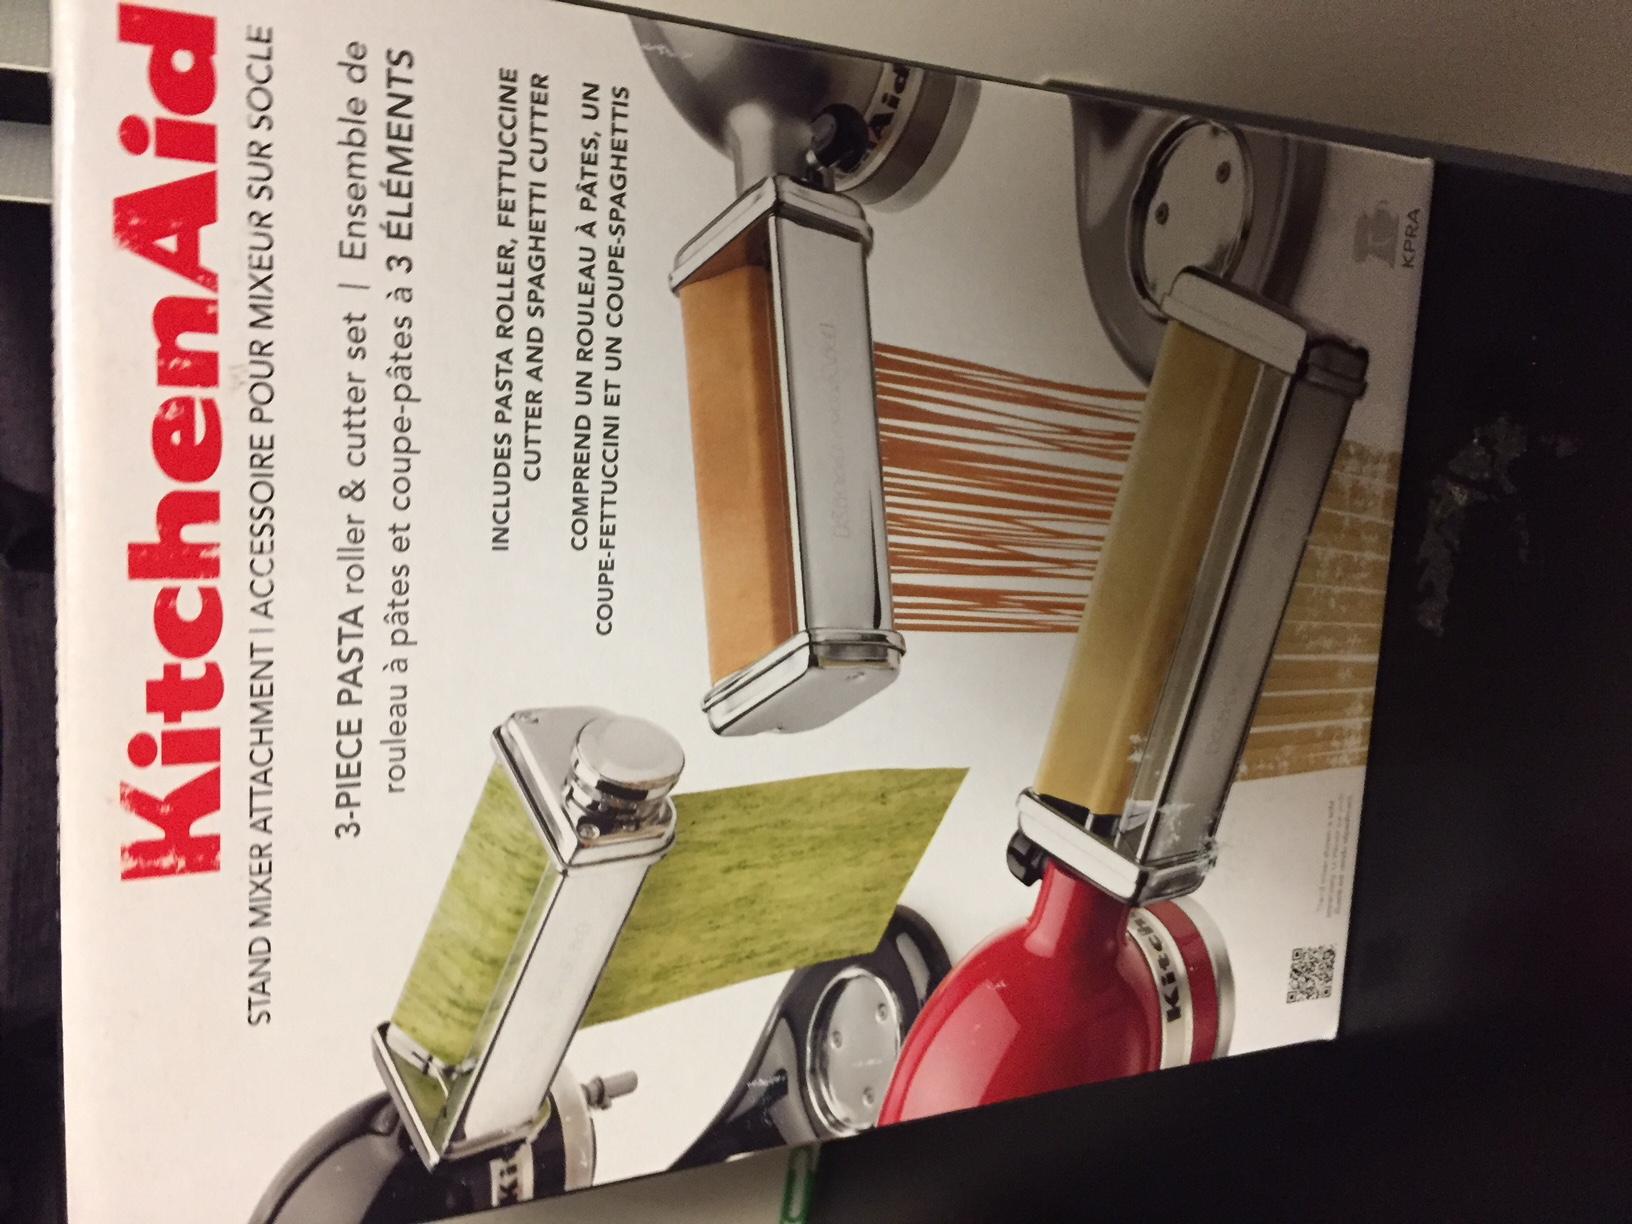 300a3d9eef7c5 Kitchenaid 3-Piece Pasta Roller   Cutter Attachment Set -  89.99   Costco